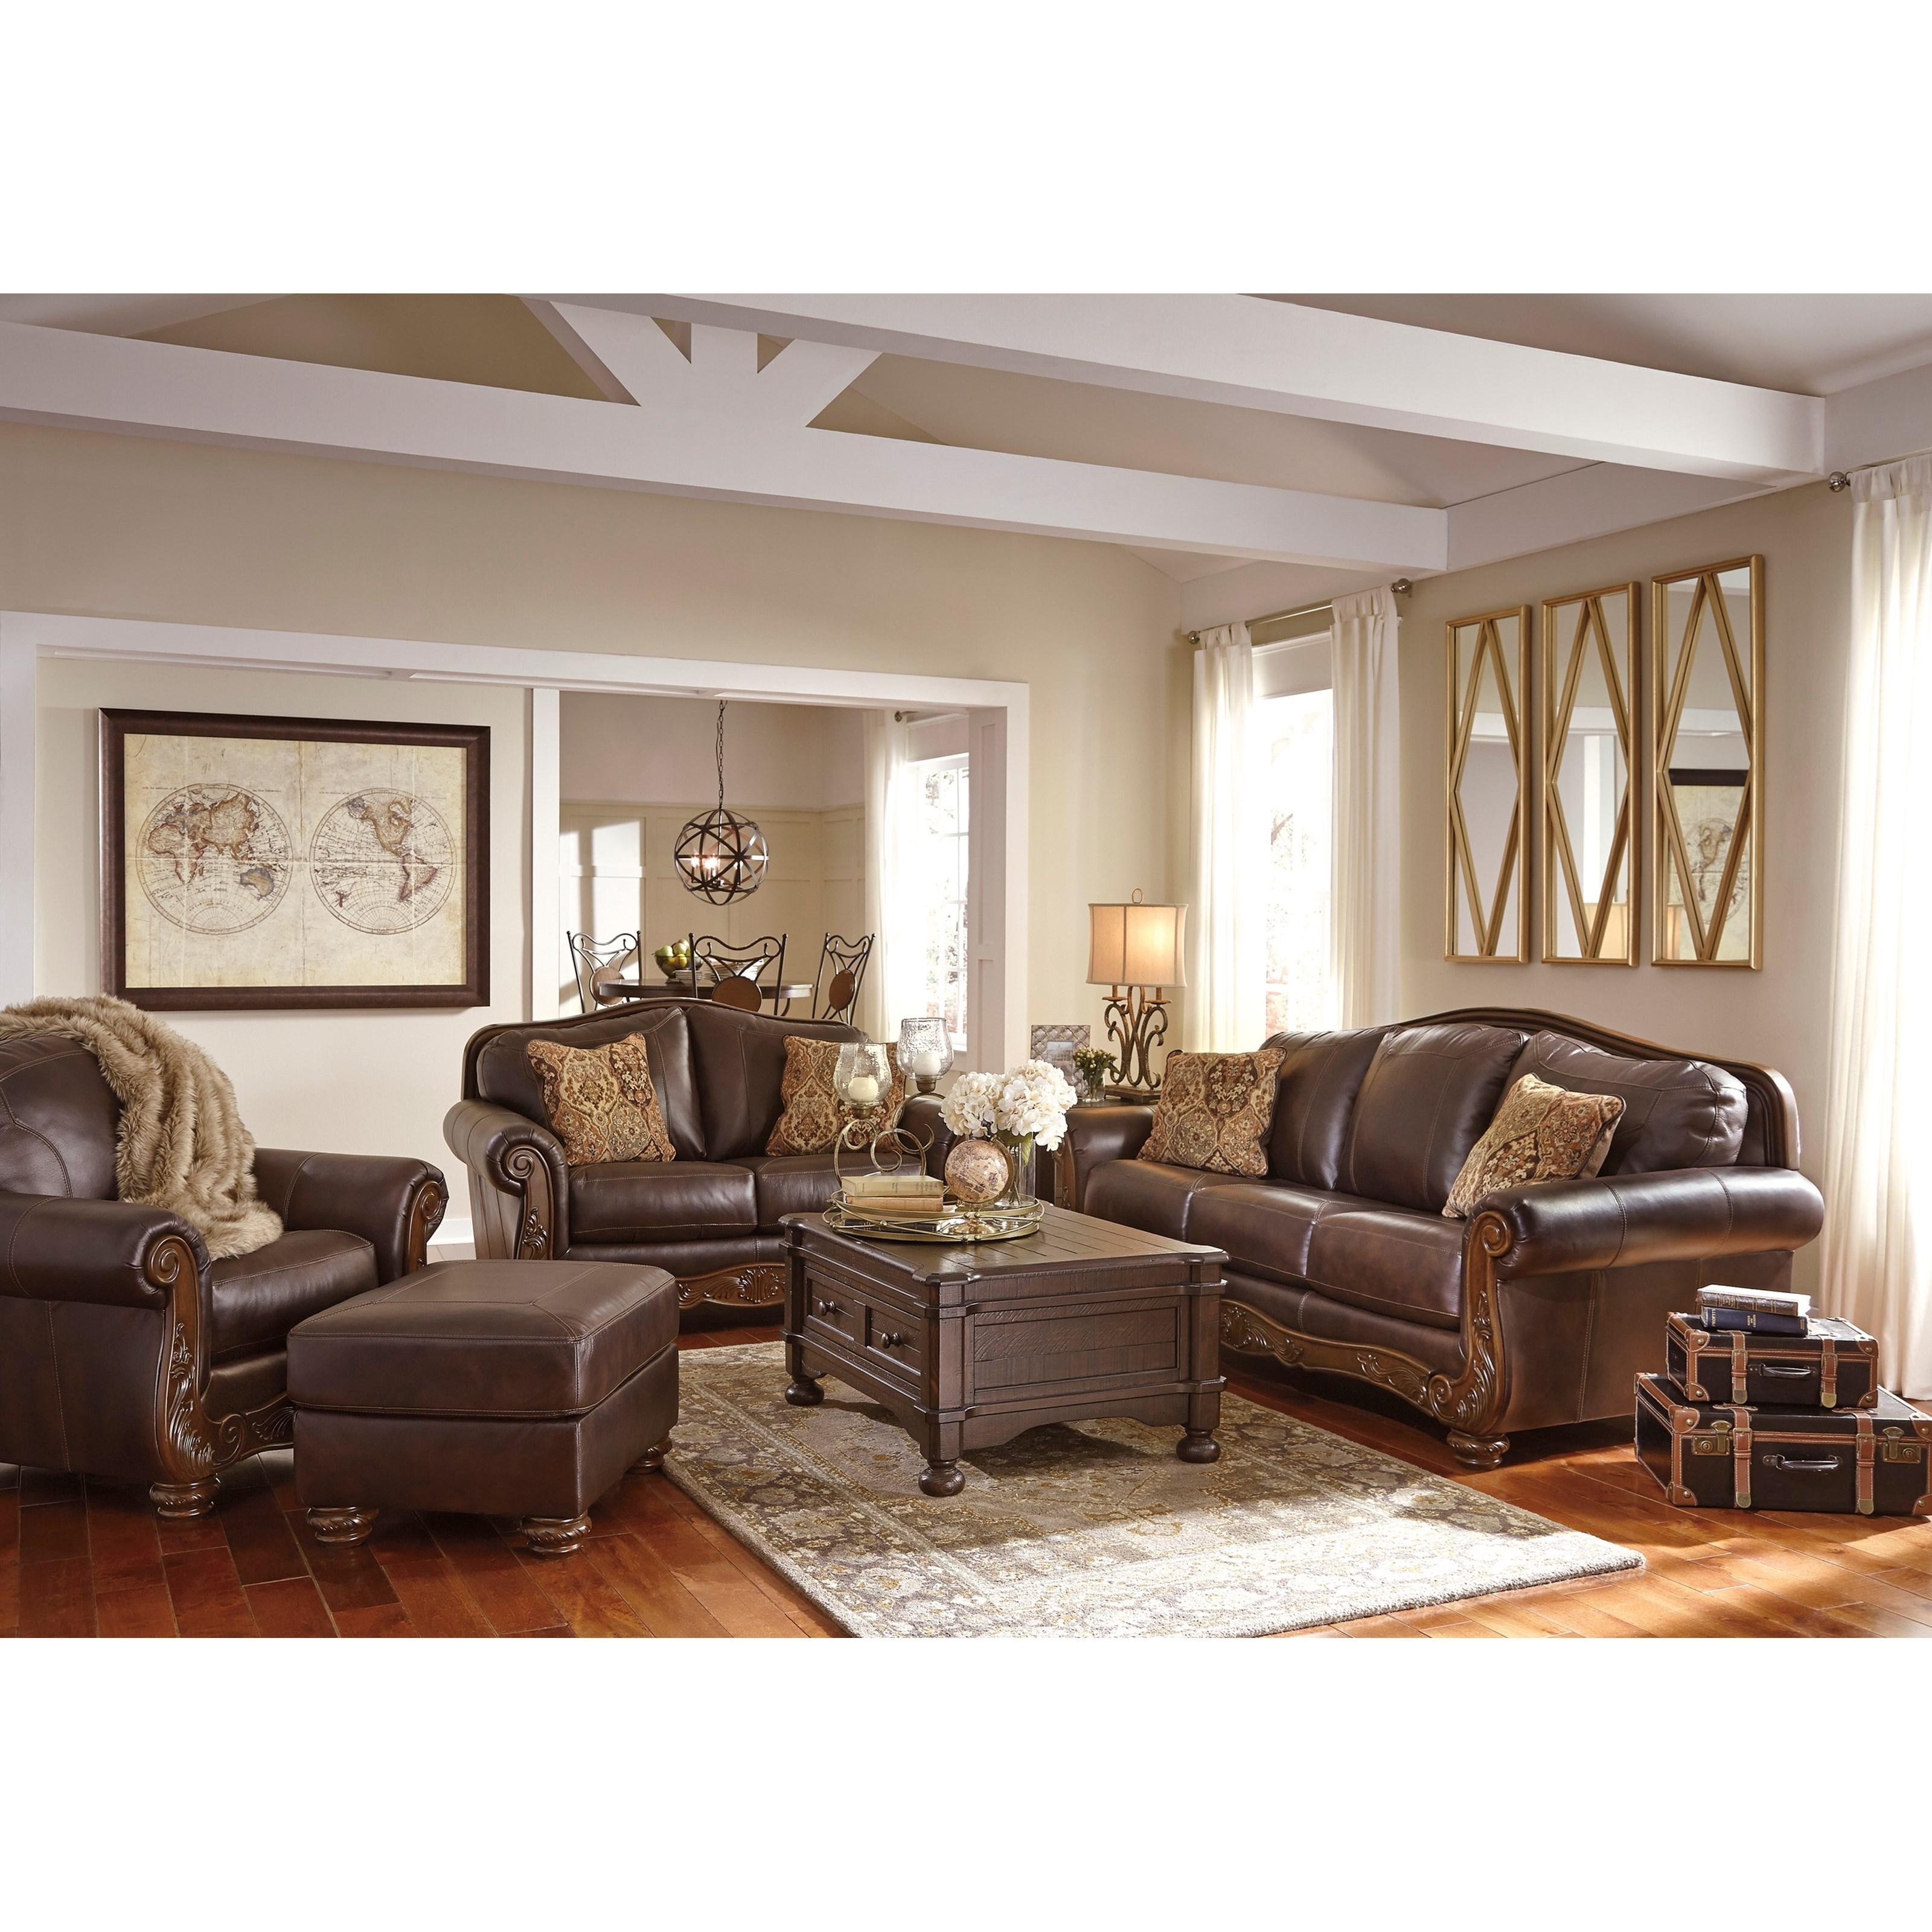 Wolf Furniture